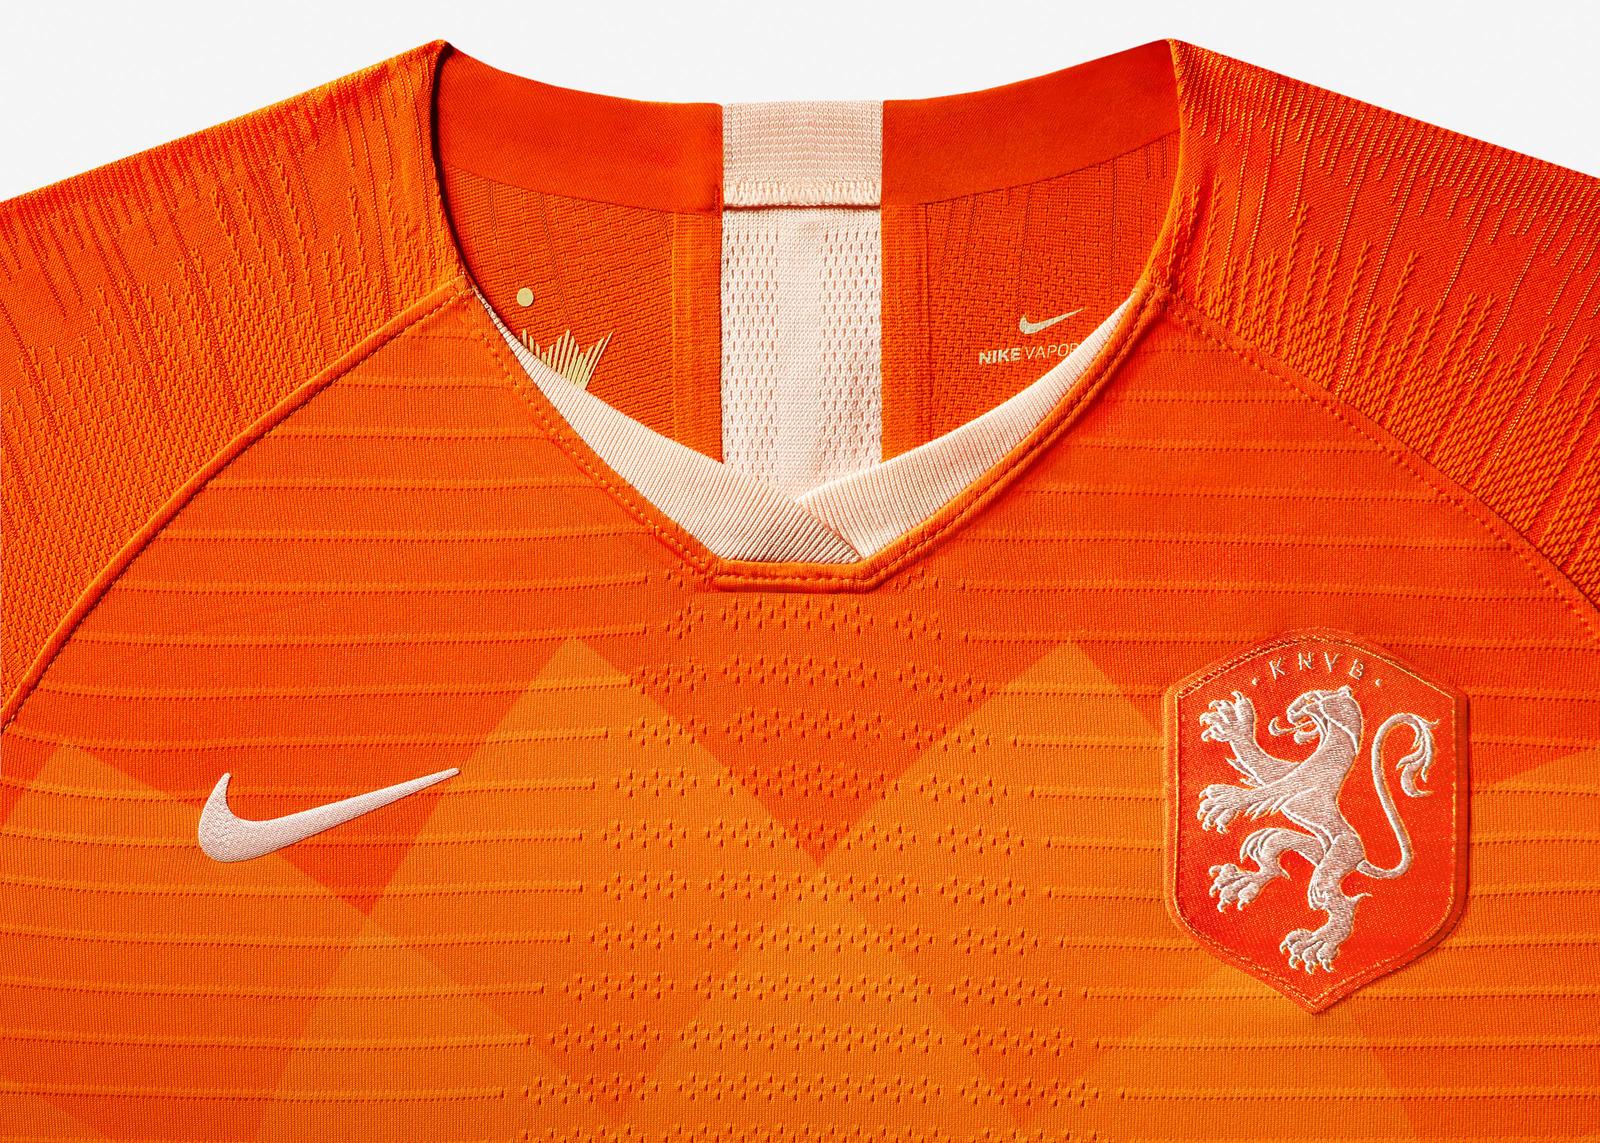 8b5b7cae2bd Oranje Leeuwinnen WK 2019 voetbalshirt - Voetbalshirts.com